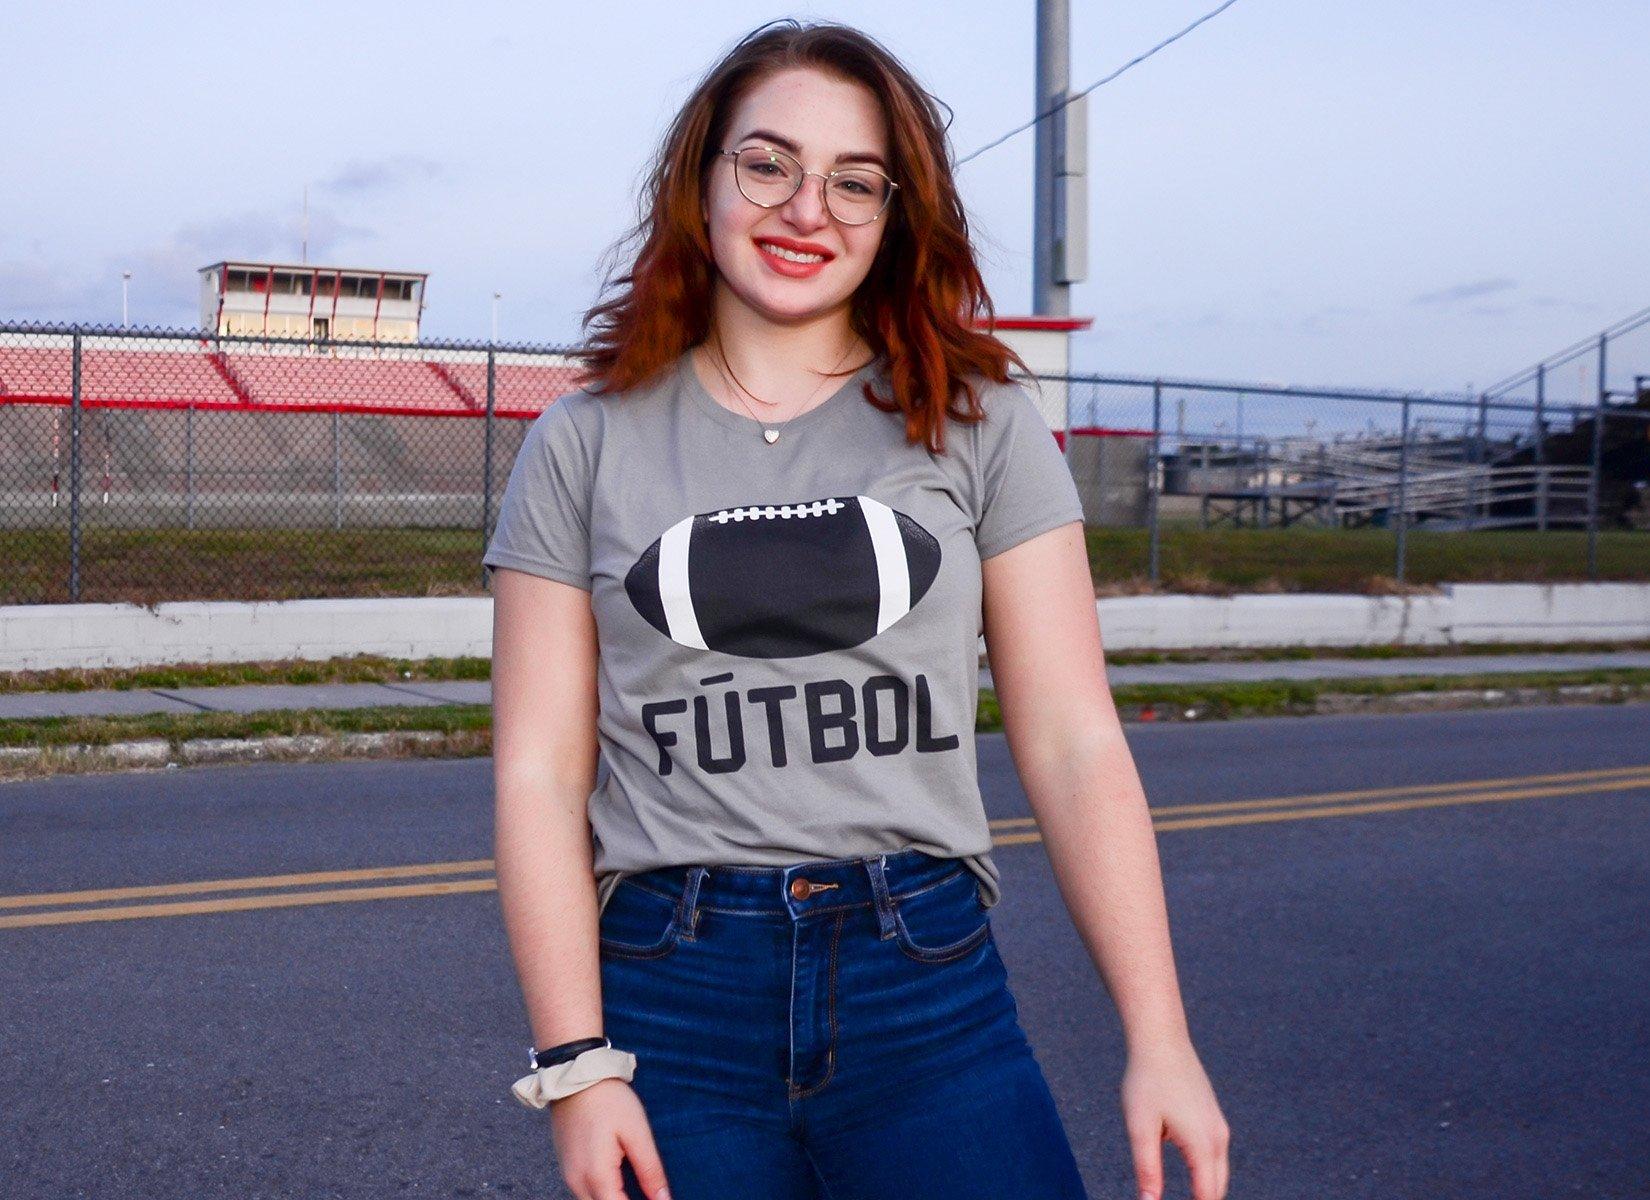 Futbol on Womens T-Shirt